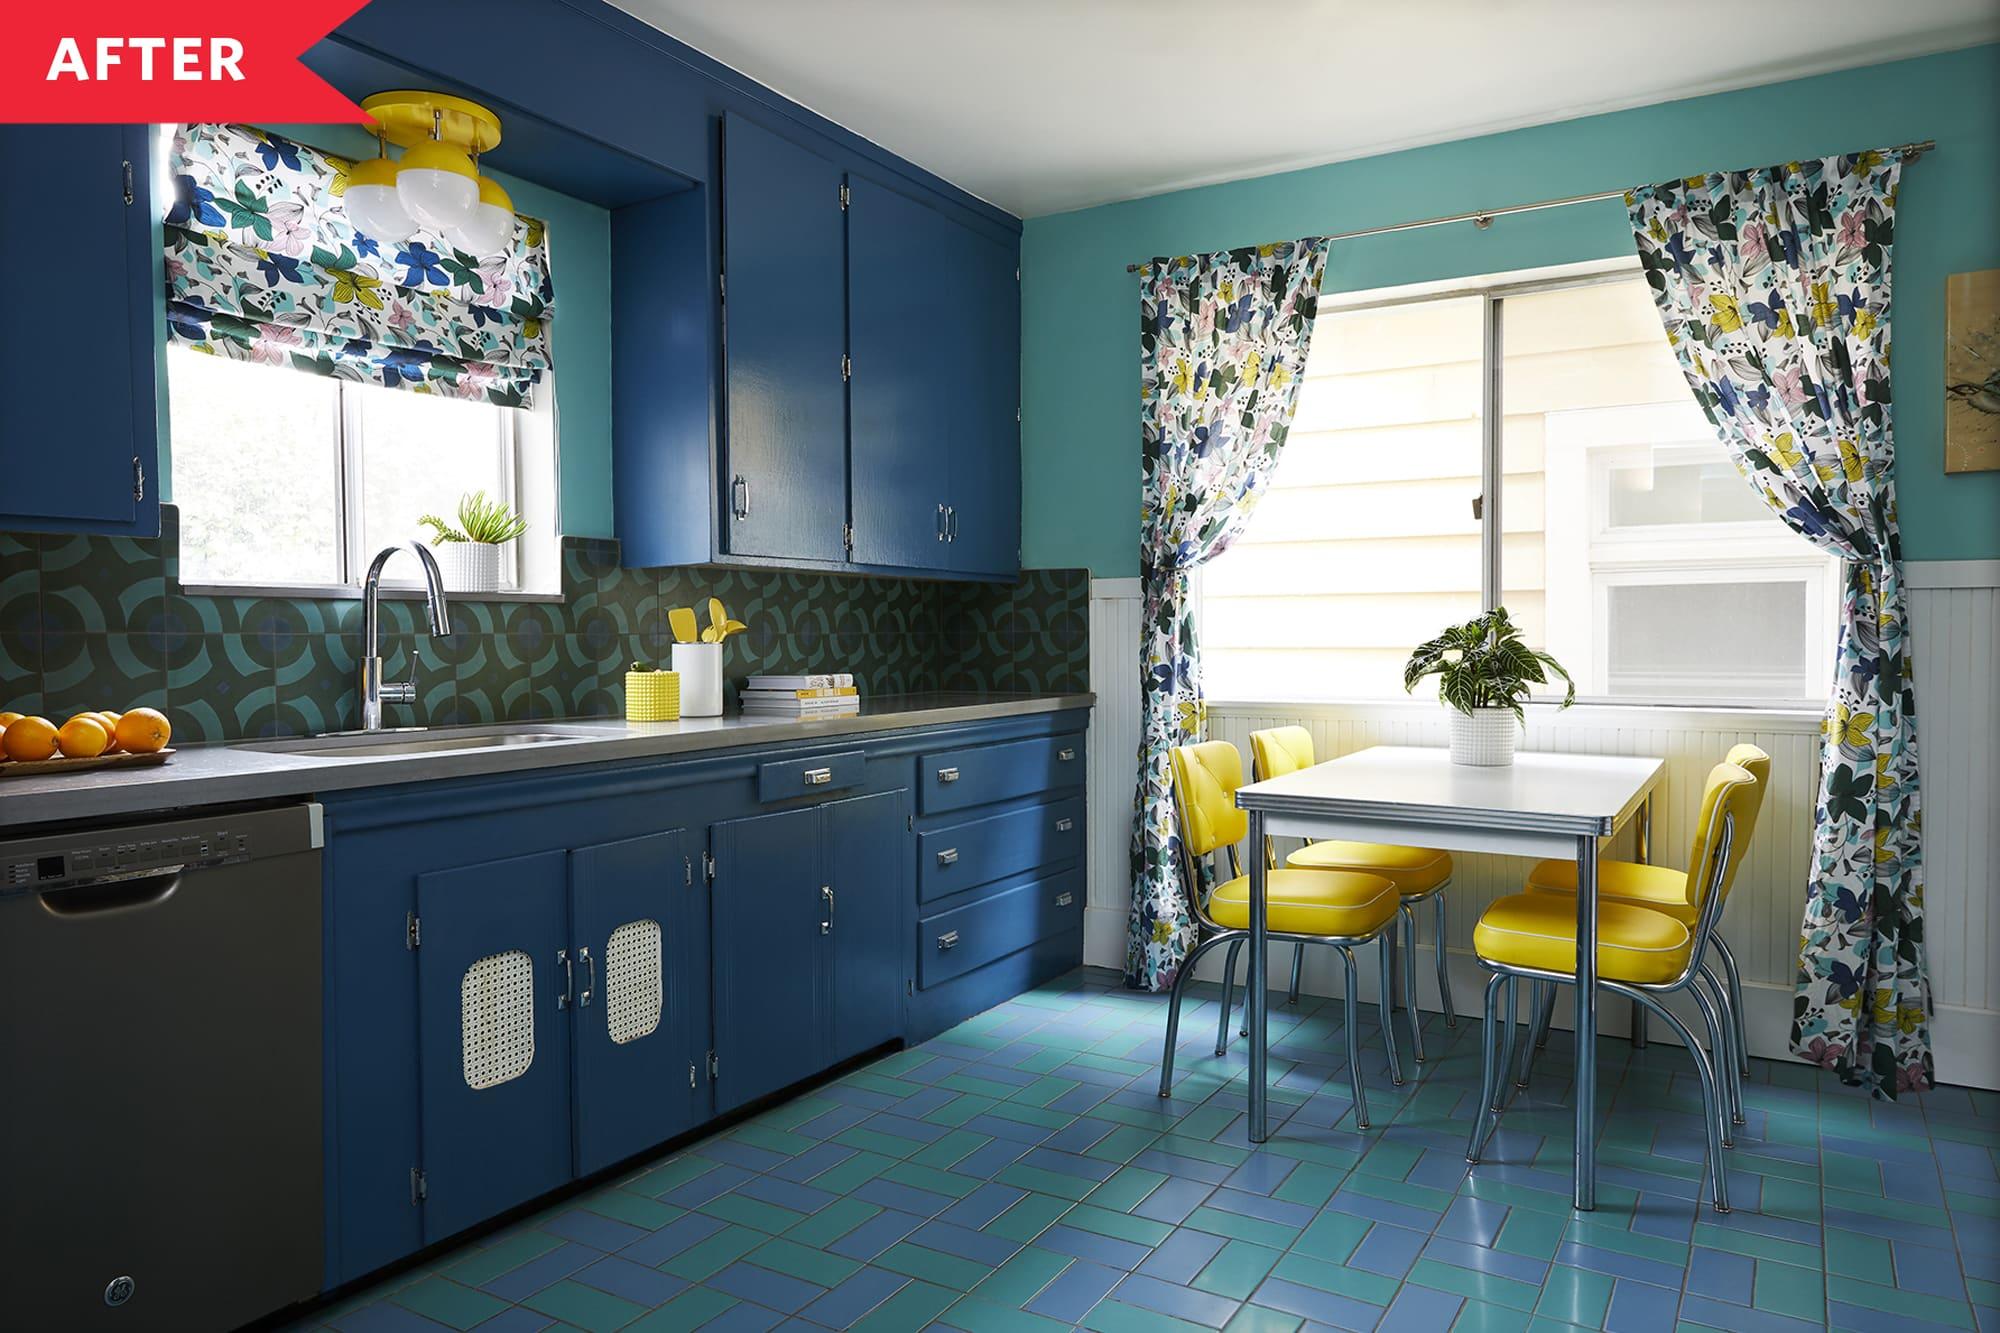 9 Cool Retro Kitchens   Fun Kitchens With Vintage Style ...